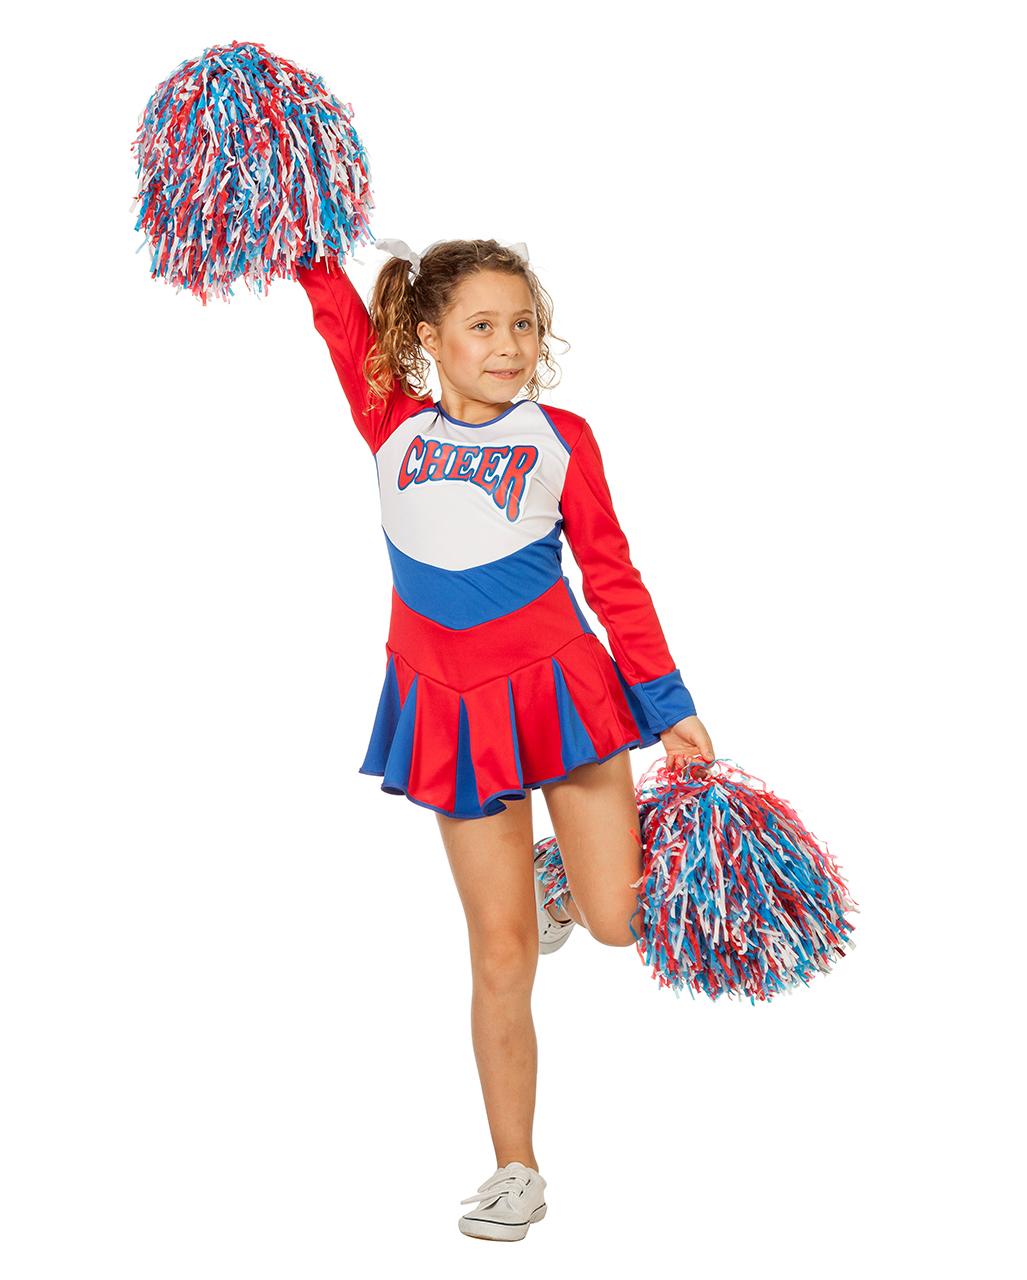 Cheerleader Children Costume Red Blue For Carnival Horror Shop Com